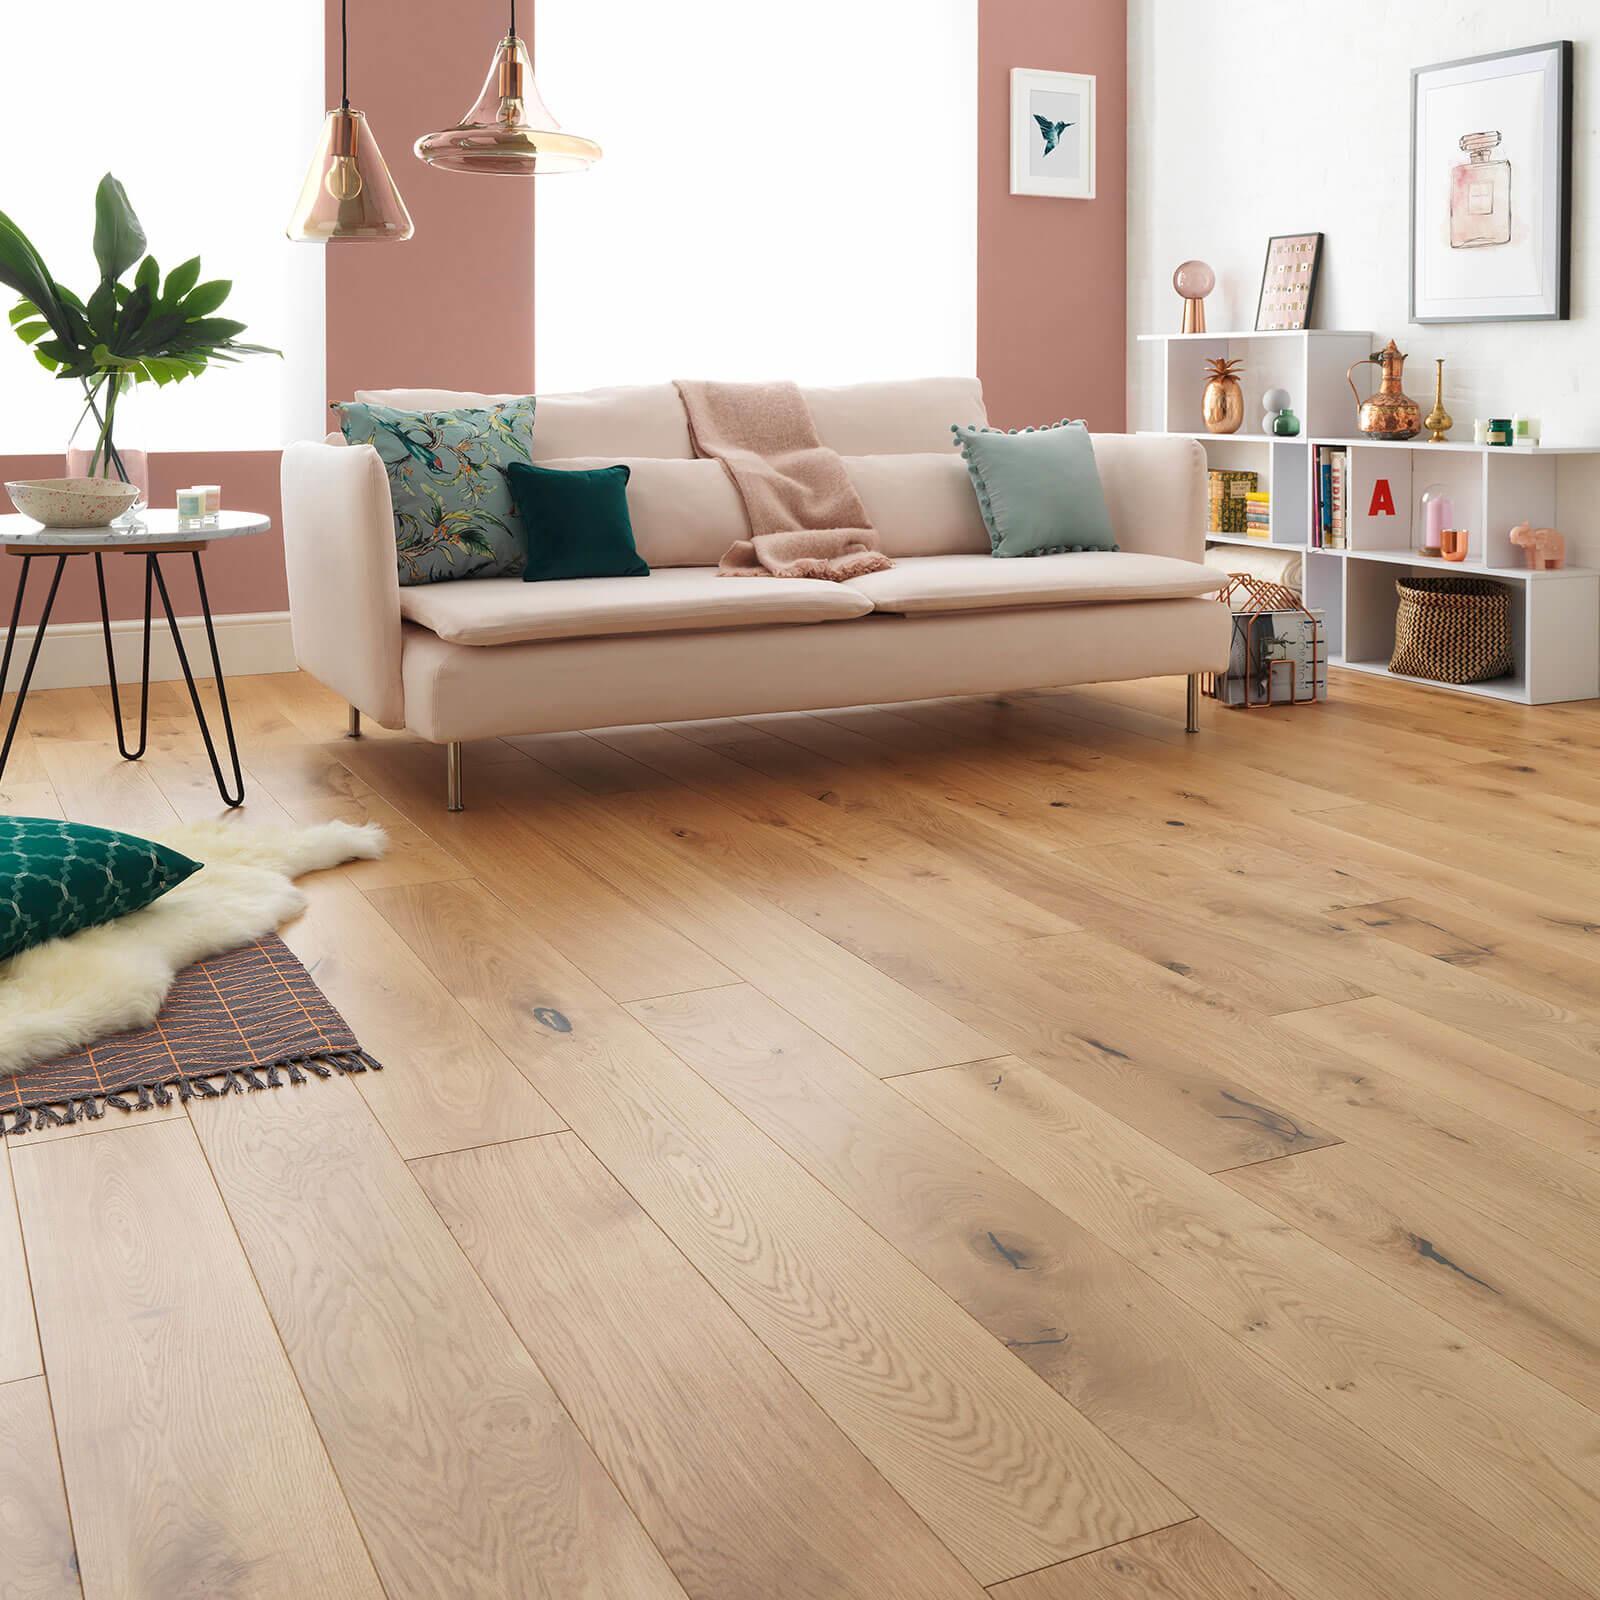 Rustic Oak Harlech Woodpecker Flooring Oiled Lifestyle 2